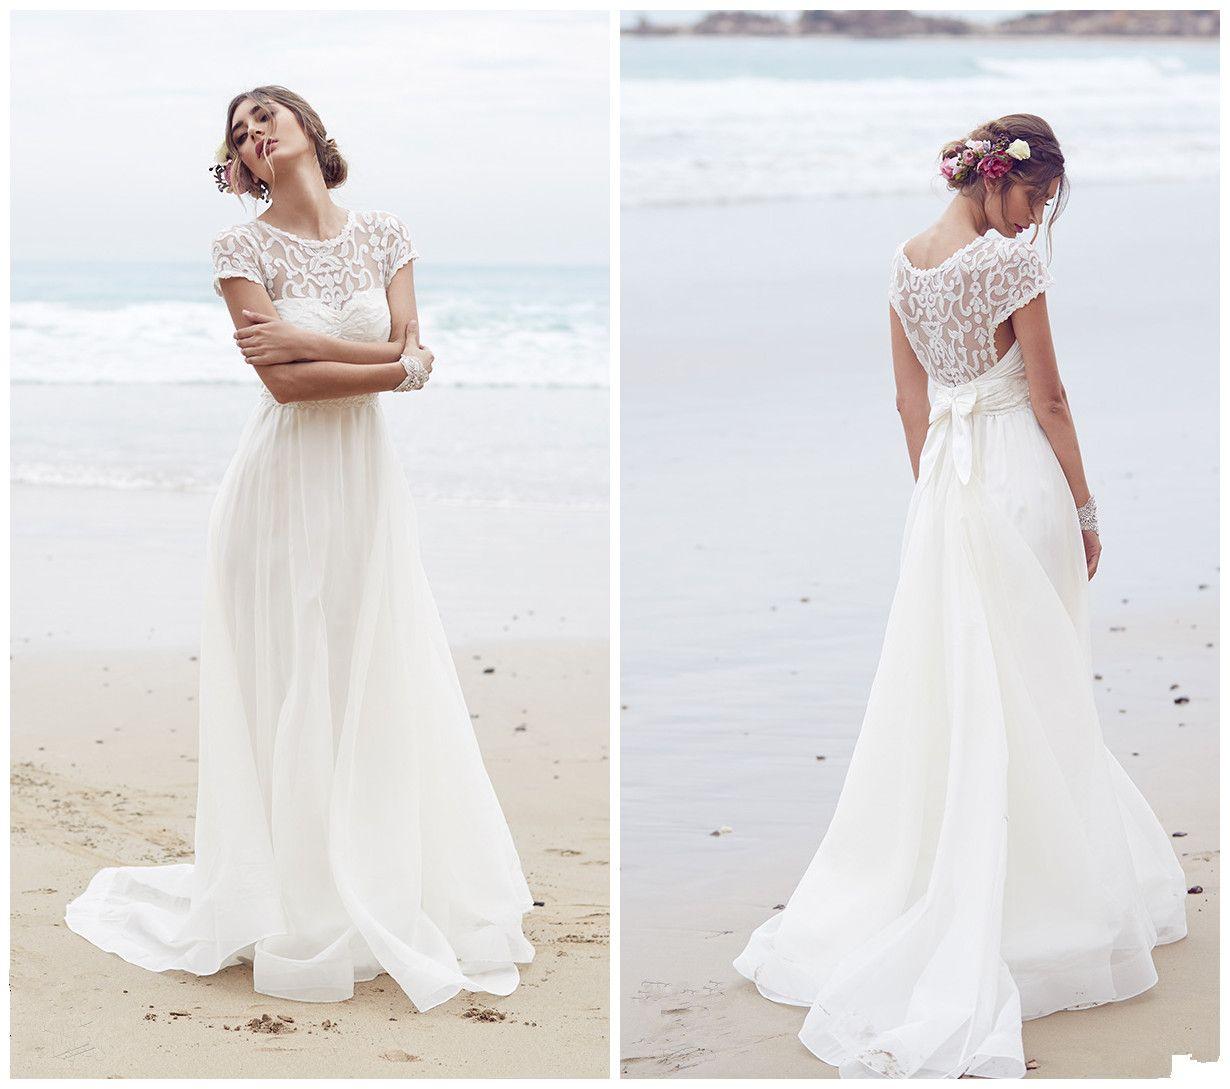 Anna Campbell Wedding Gowns: Customized Anna Campbell Wedding Dresses 2015 Popular